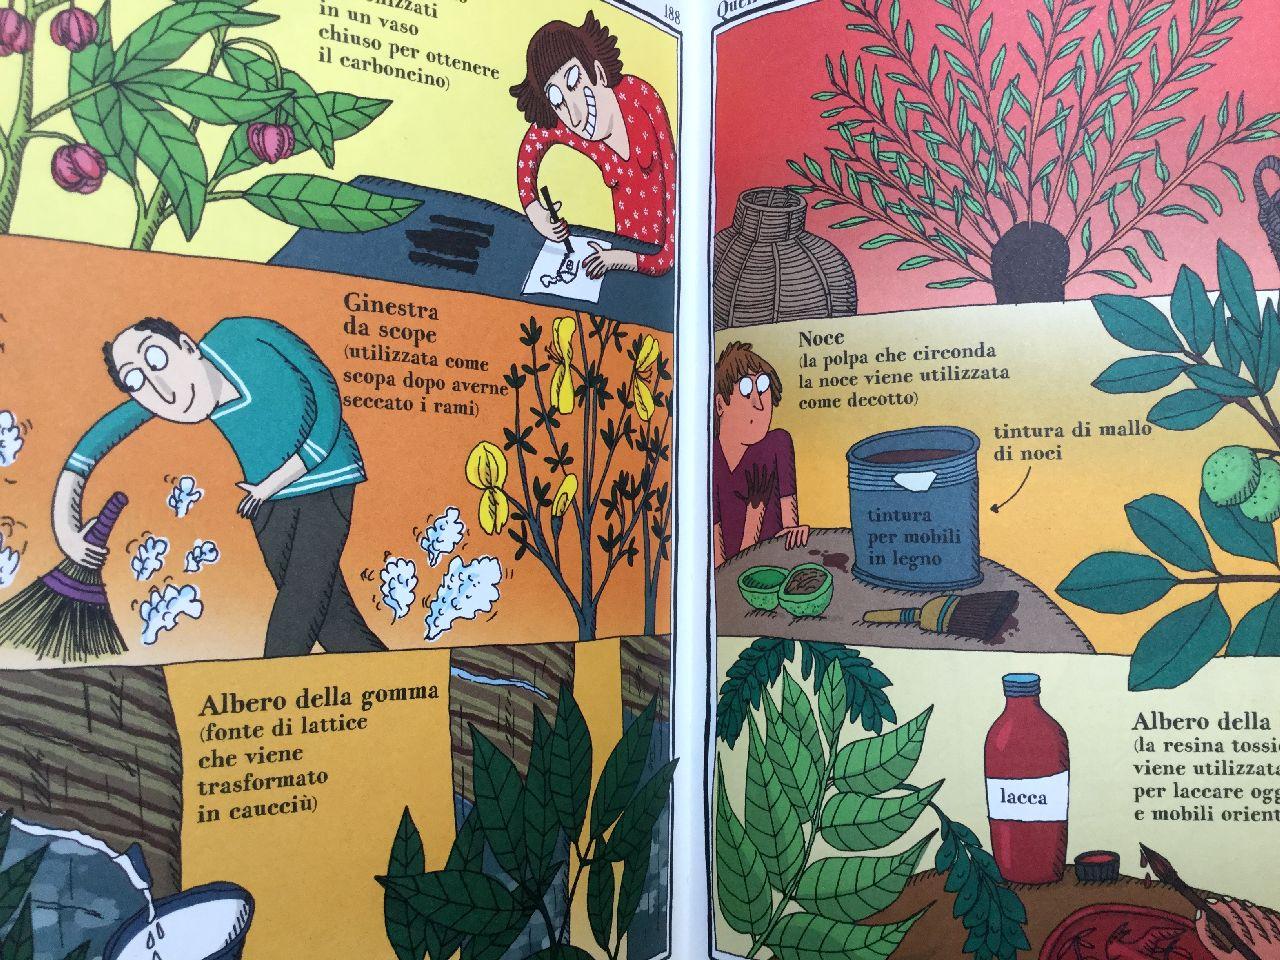 Adrienne Barman, La strana enciclopedia vegetale, Rizzoli